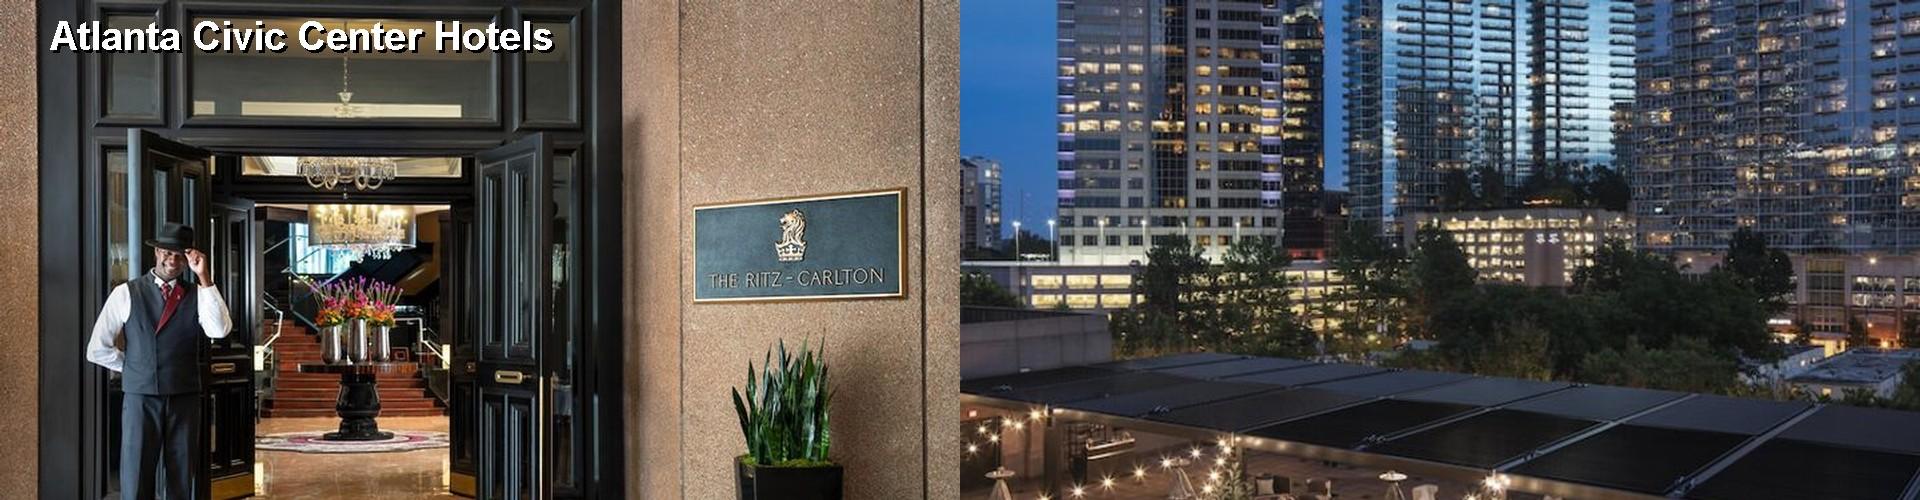 5 Best Hotels Near Atlanta Civic Center